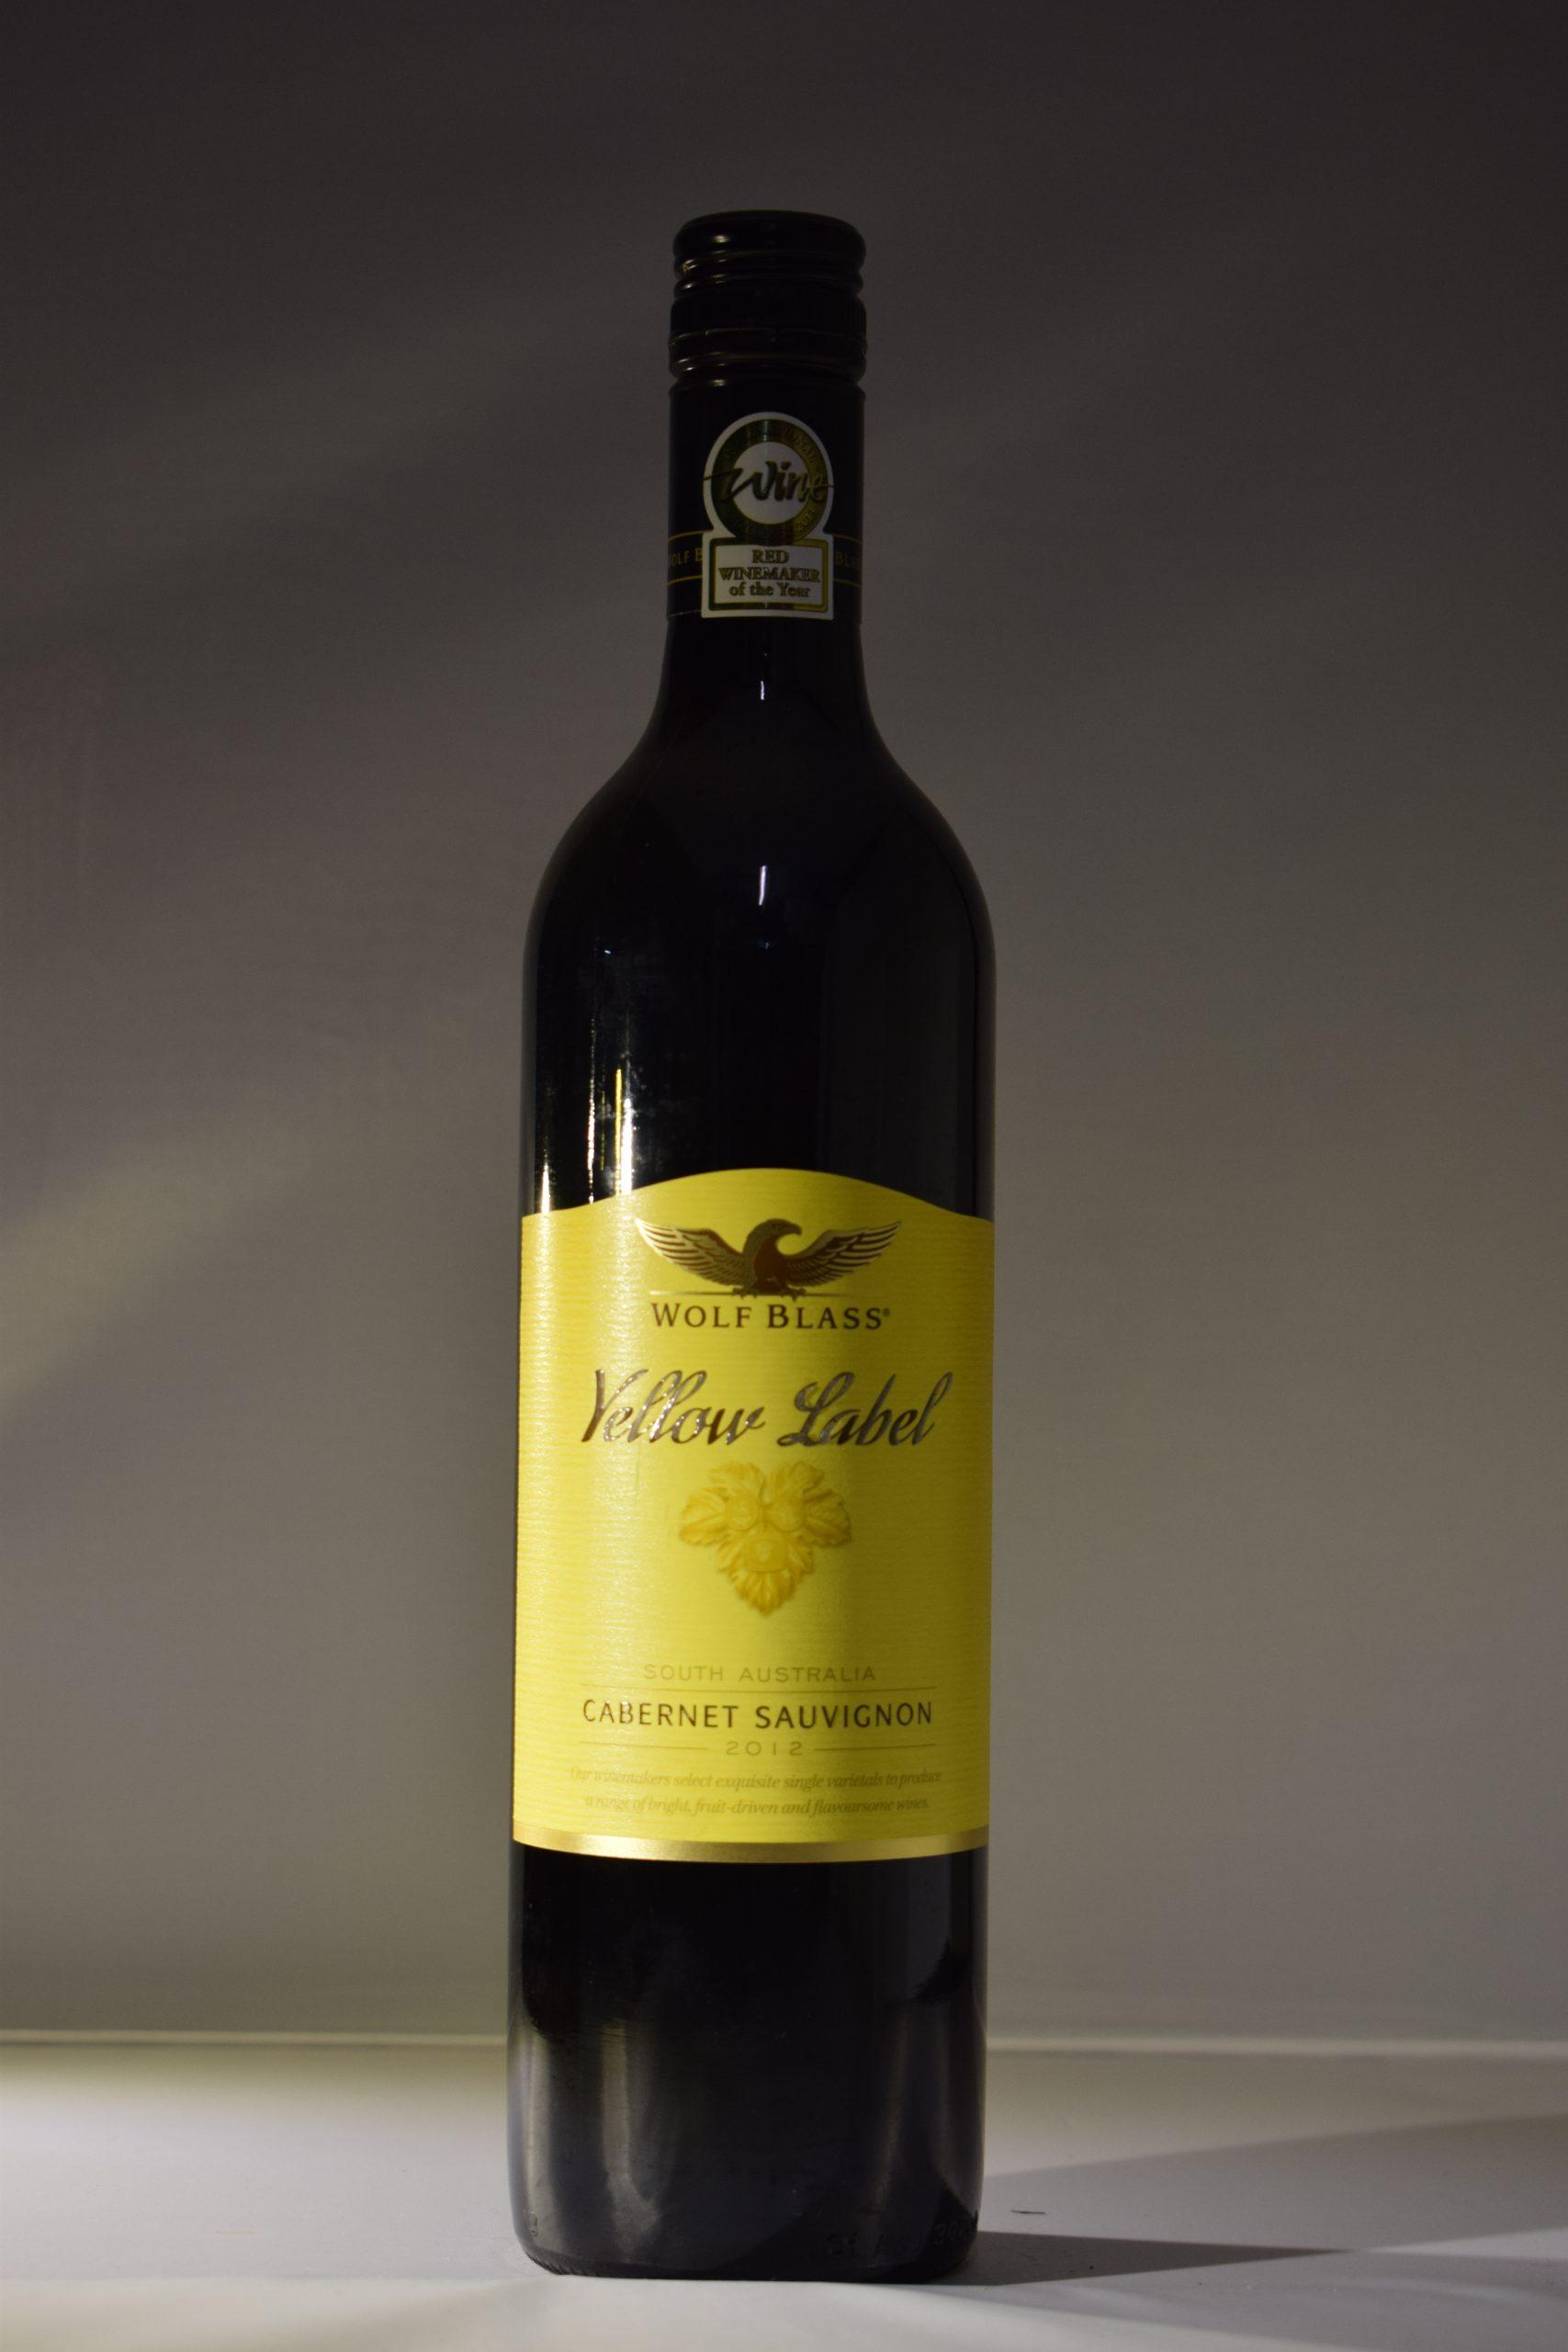 Wolf Blass Yellow Label Cabernet Sauvignon 2012